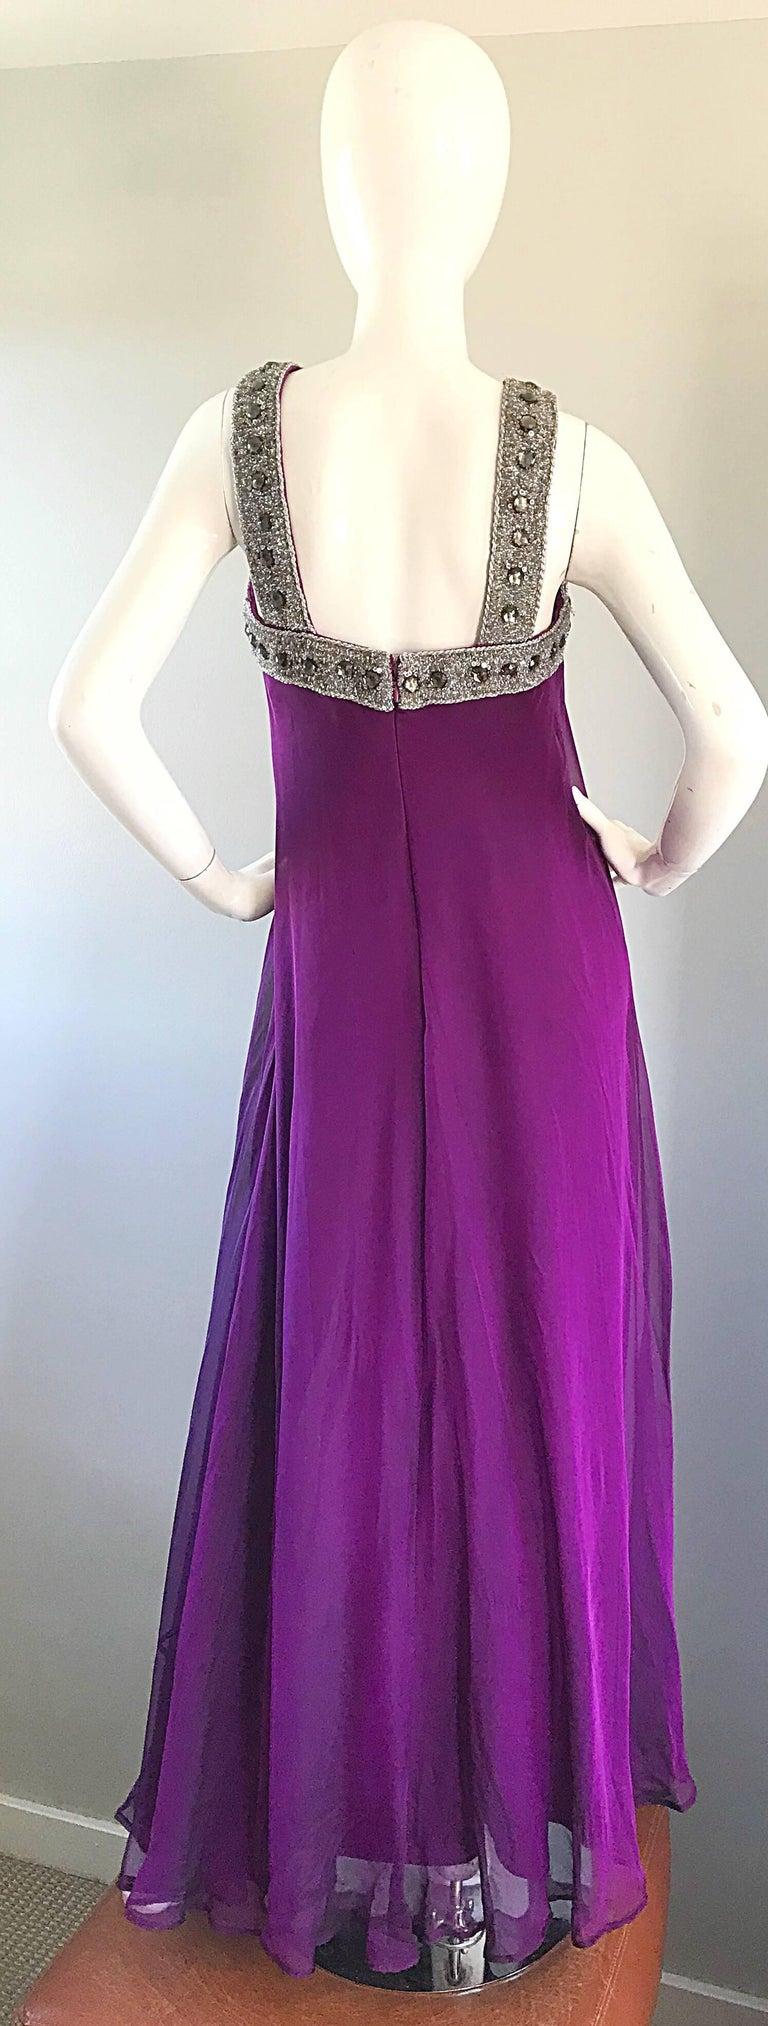 1990s Badgley Mischka Sz 4 6 Purple Silk Chiffon Rhinestone Vintage Grecian Gown For Sale 1